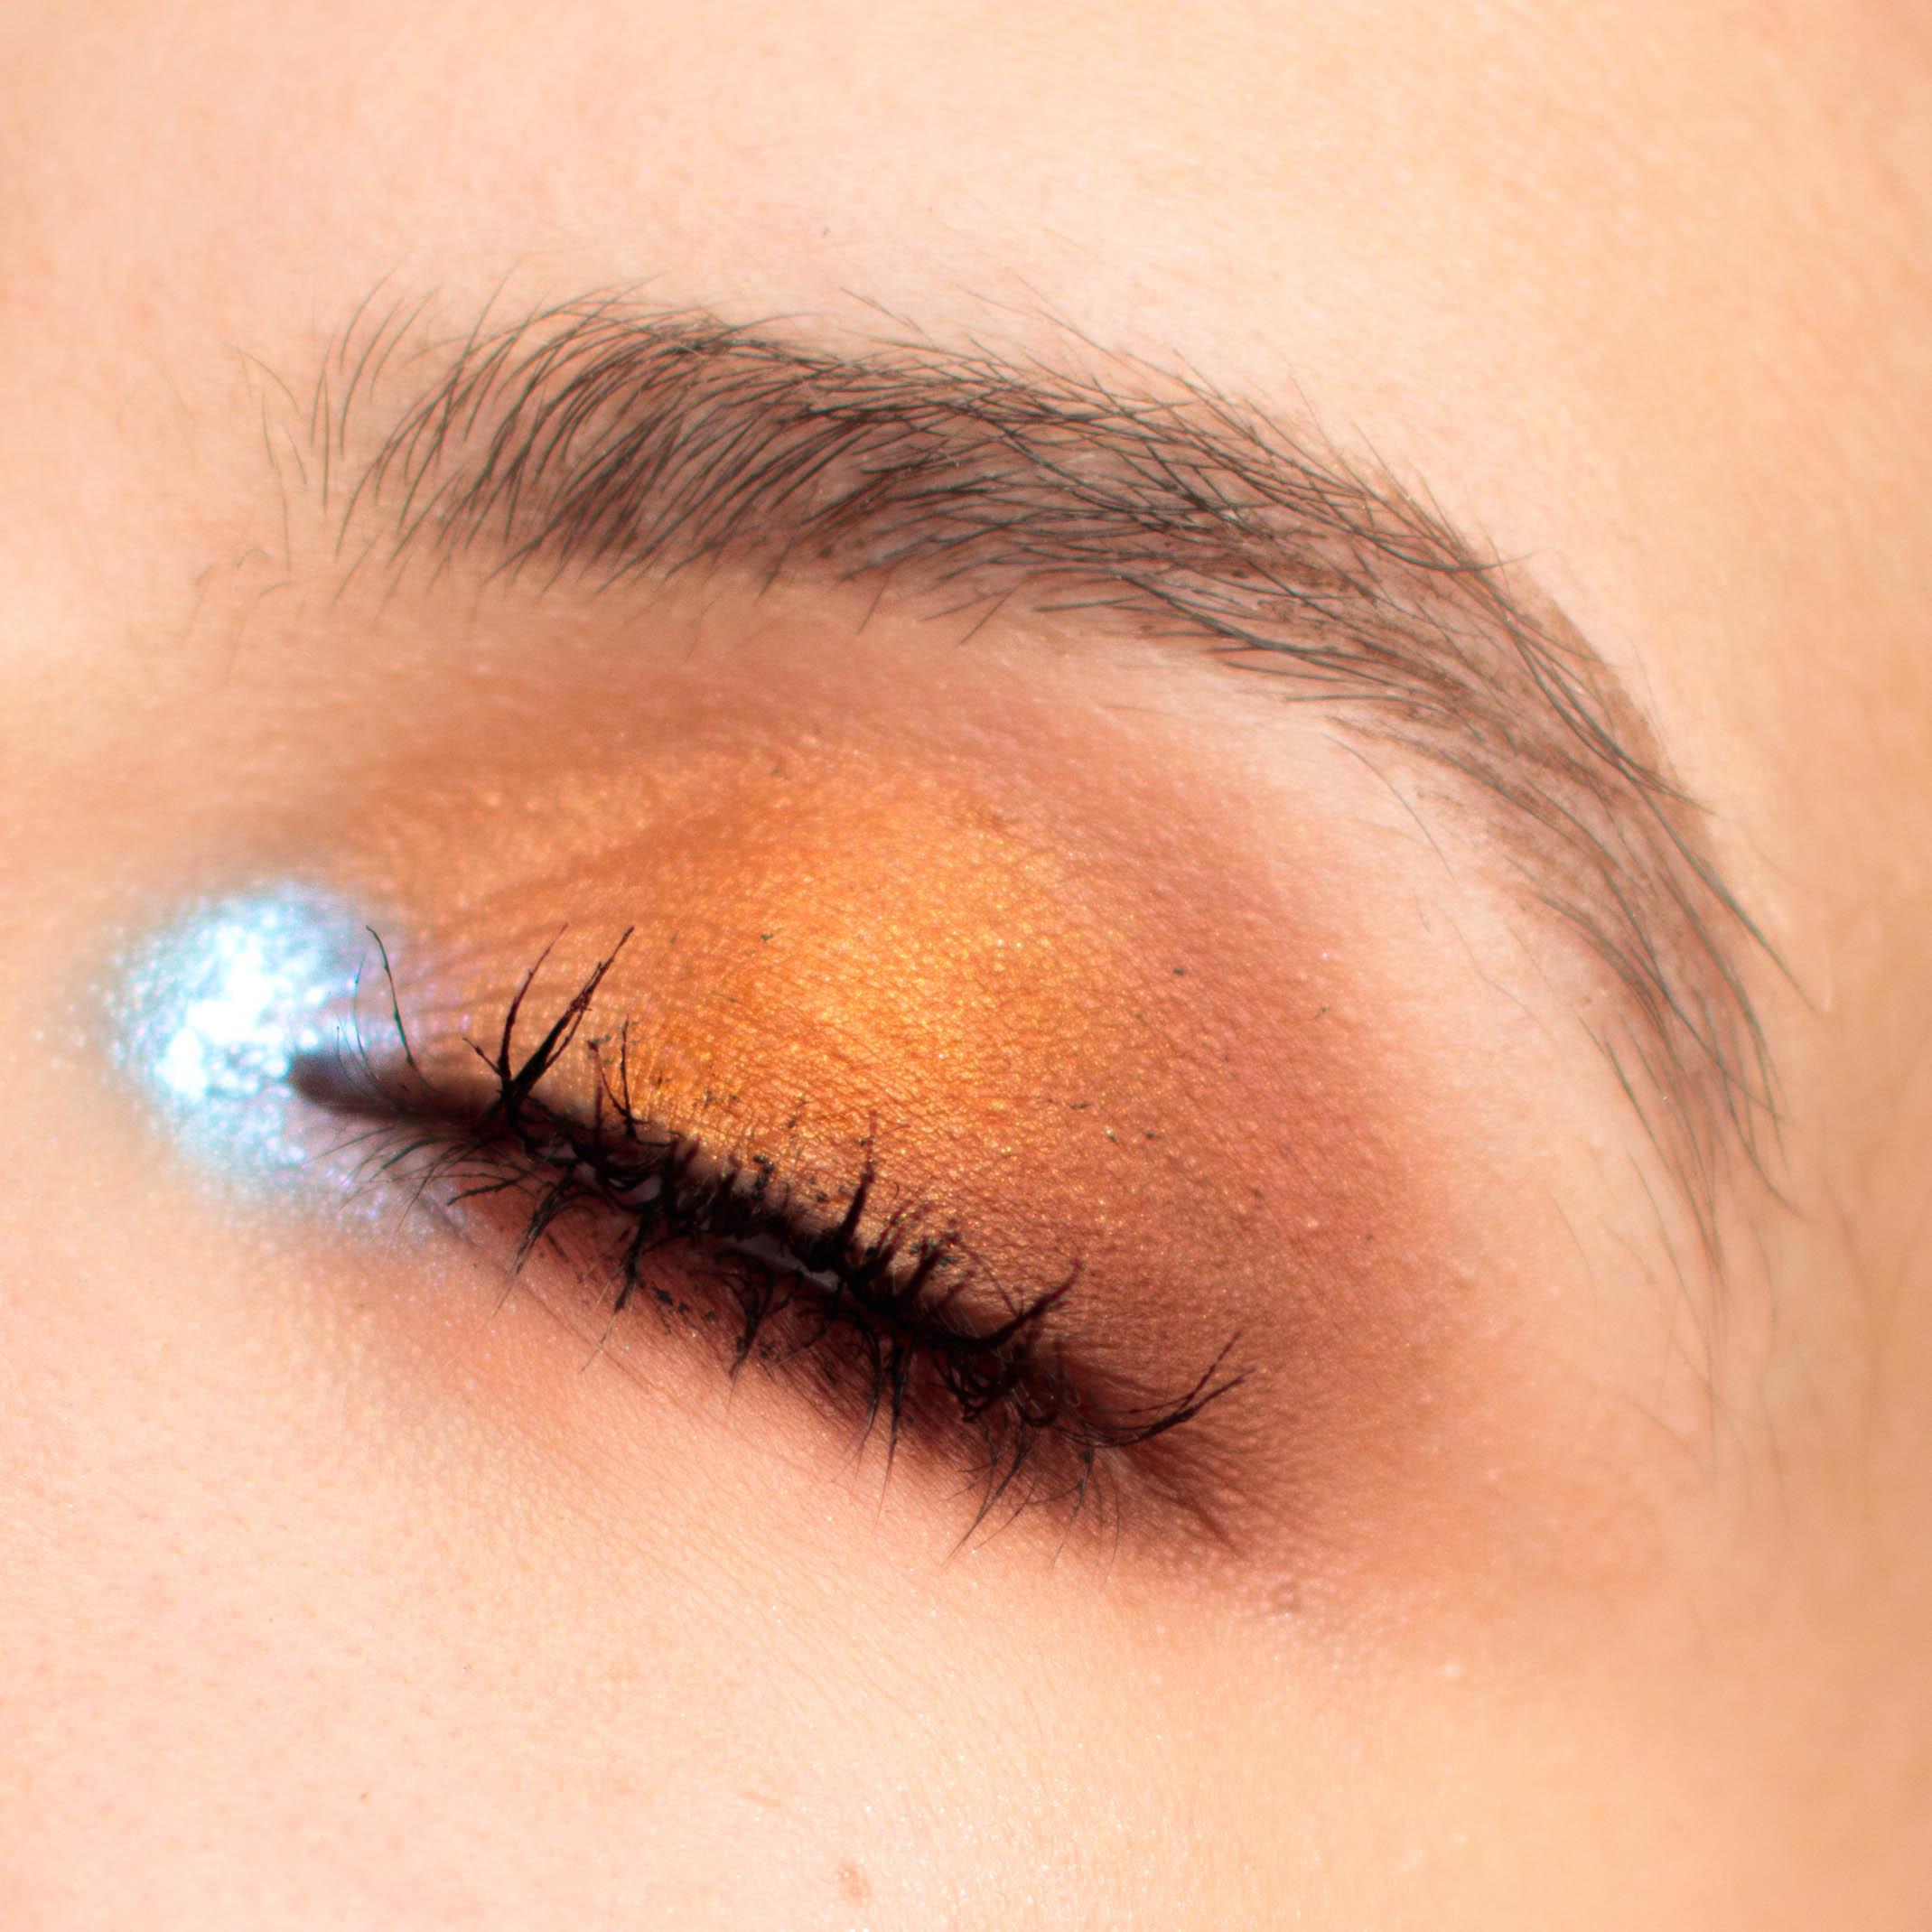 gumball-makeup-pauuulette-i-heart-revolution-sprinkles-palette-close-up.jpg